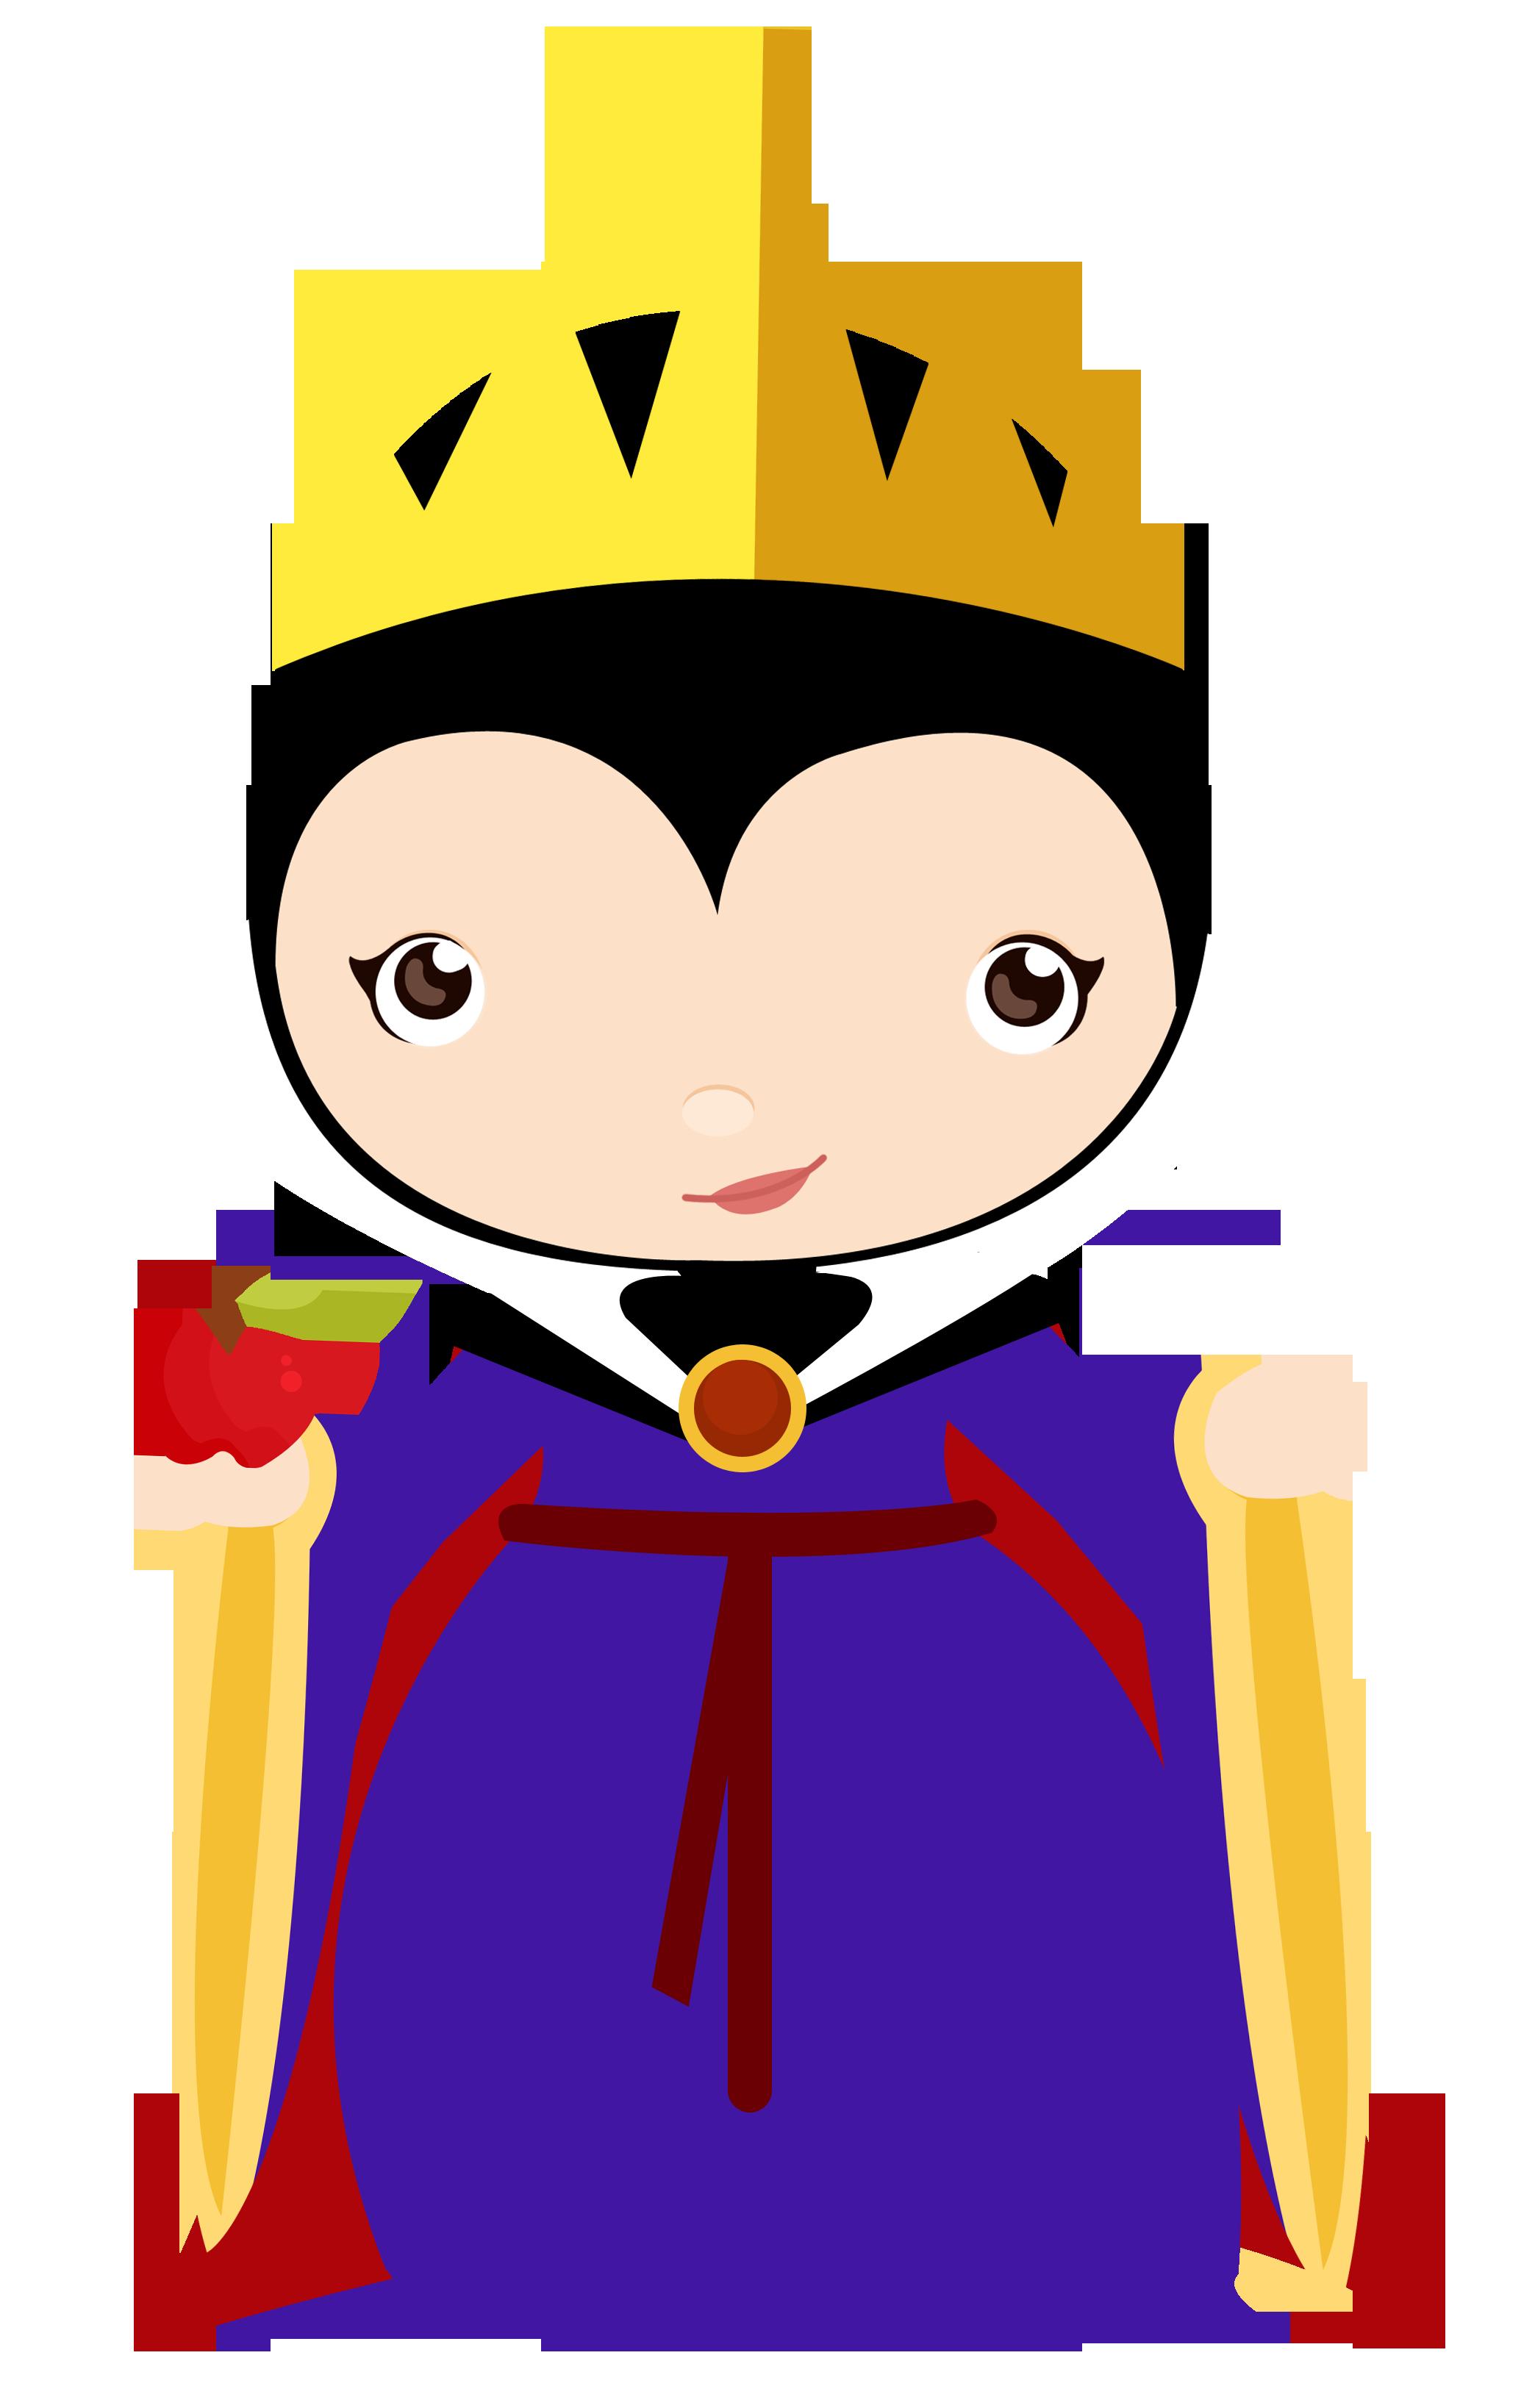 vector freeuse download Fairytale clipart villain. Vil es dos contos